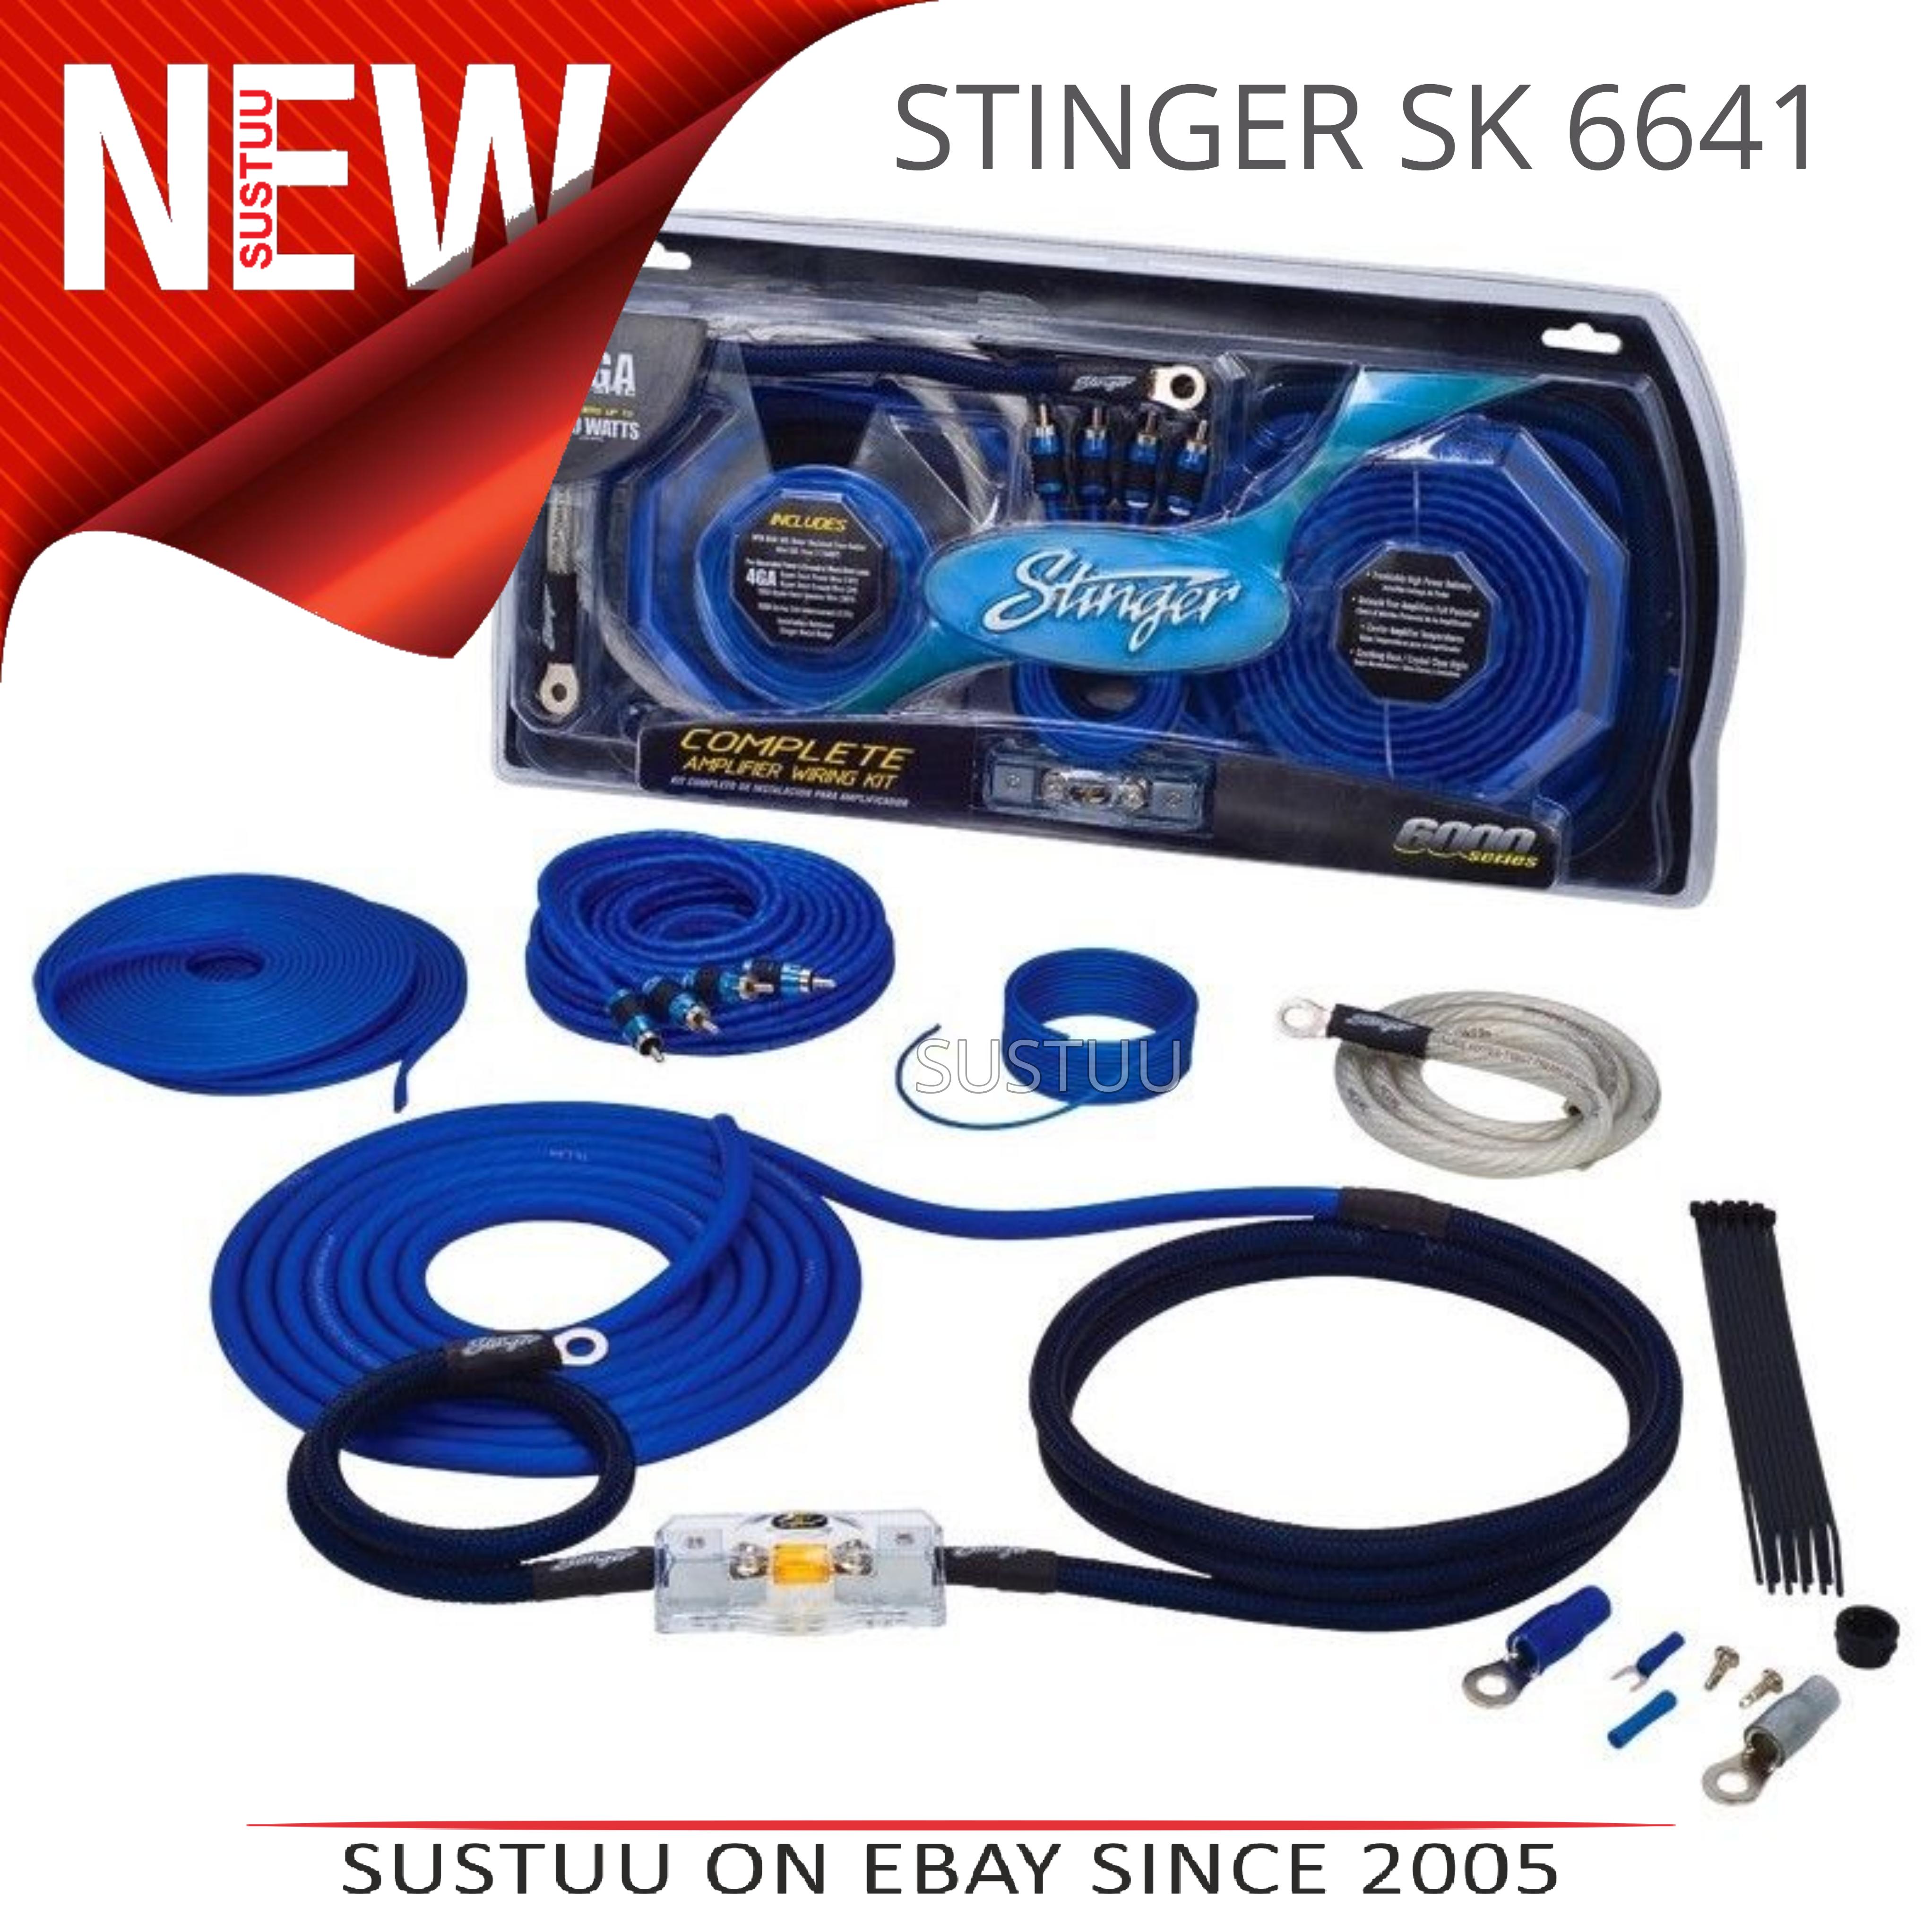 Hot 4 Gauge Amp Wiring Kit Images Wire Data Premium Power 3000w Anl Install Car Amplifier Stinger Audio Awg 6000 Series Rh Ebay Com Au